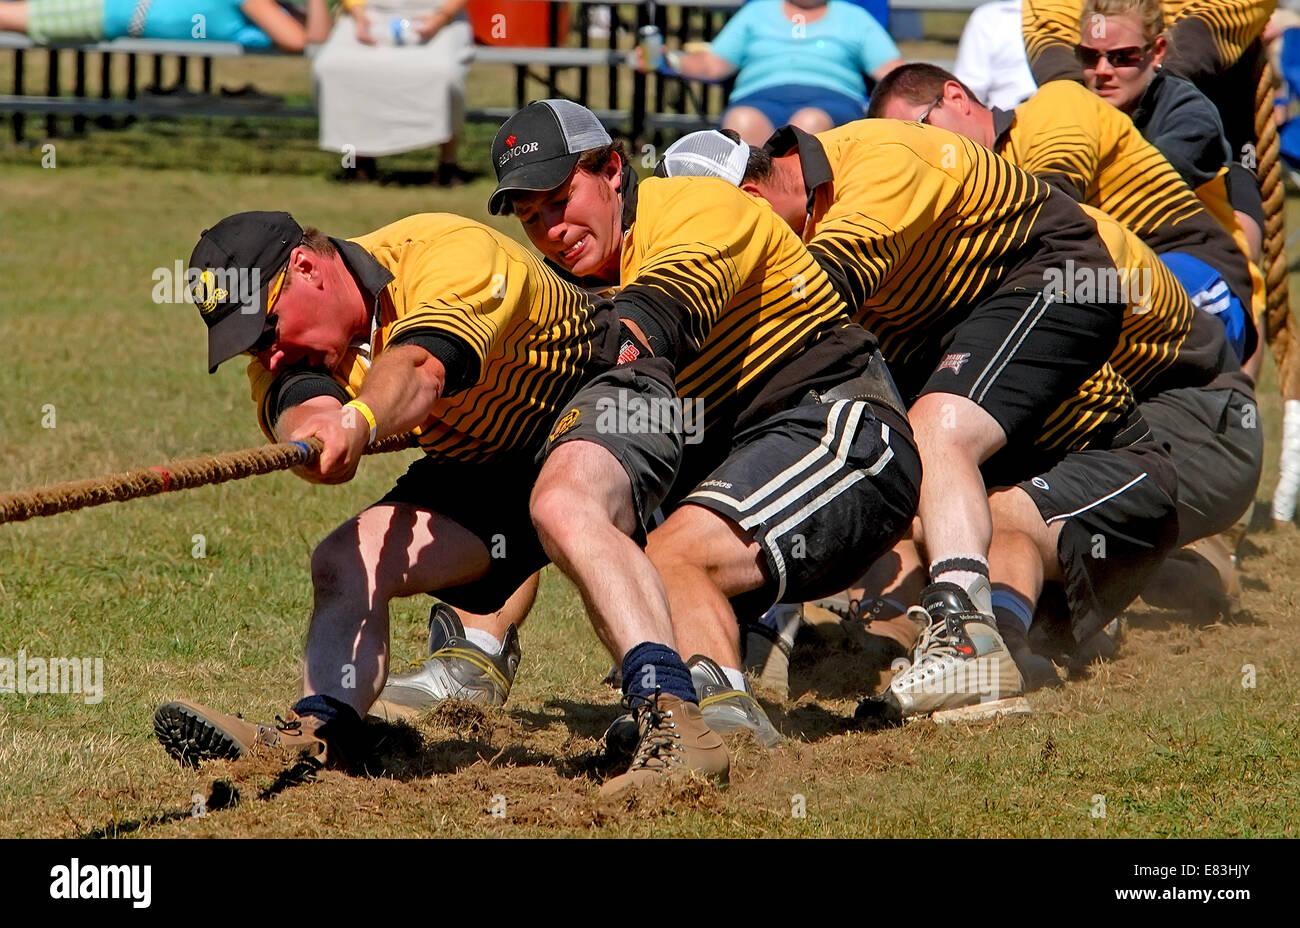 Tug-of-war, Team Sport - Stock Image